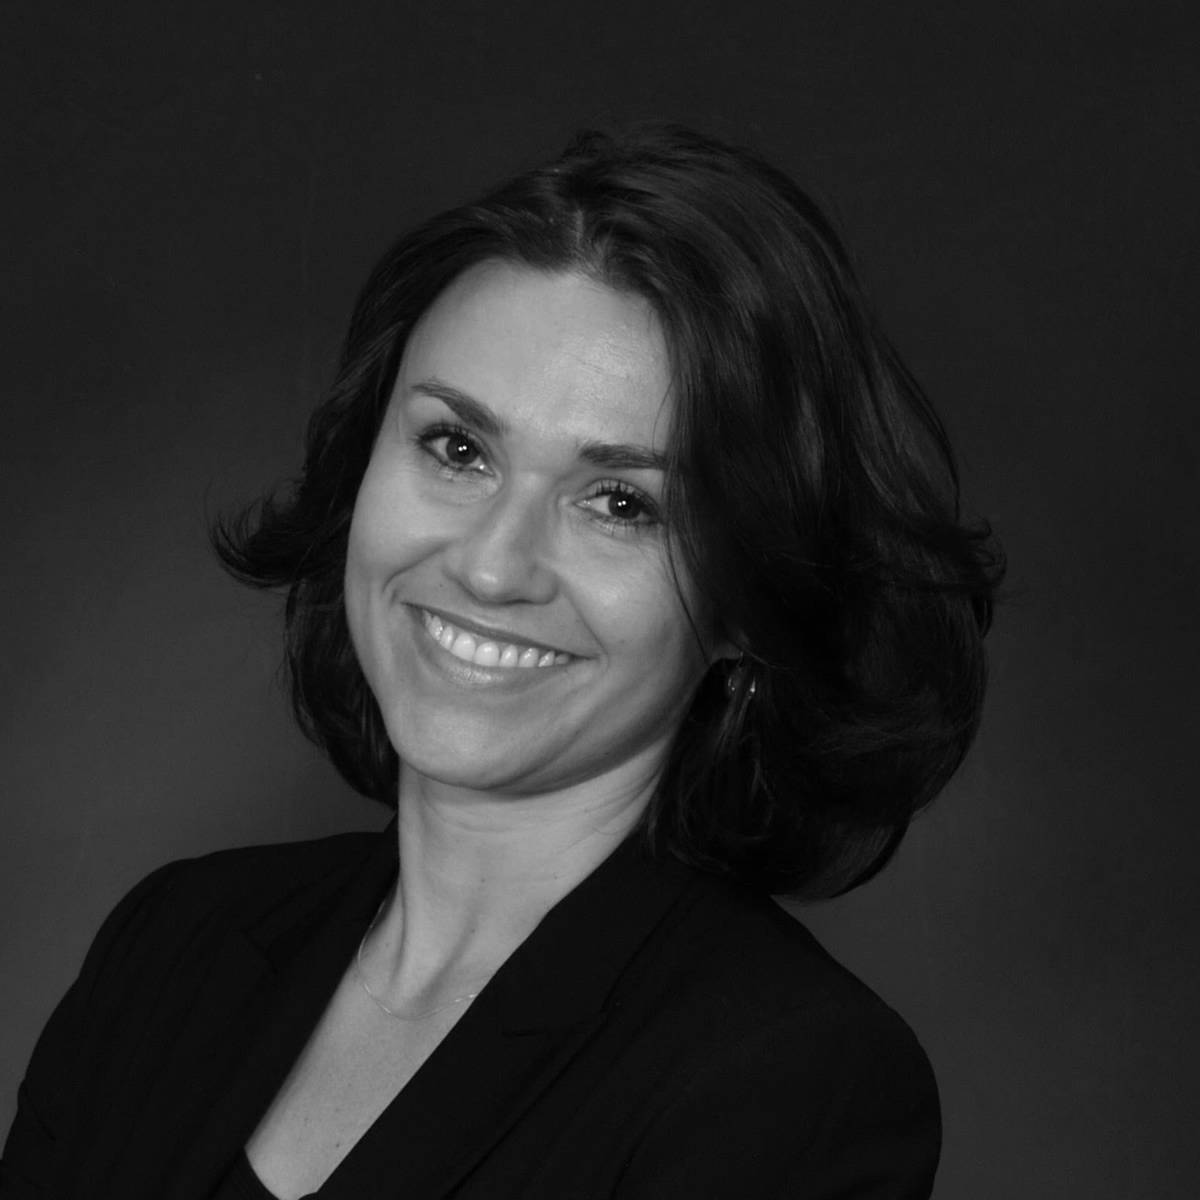 Kasia Branny, Team Lead; Enhesa S.A.